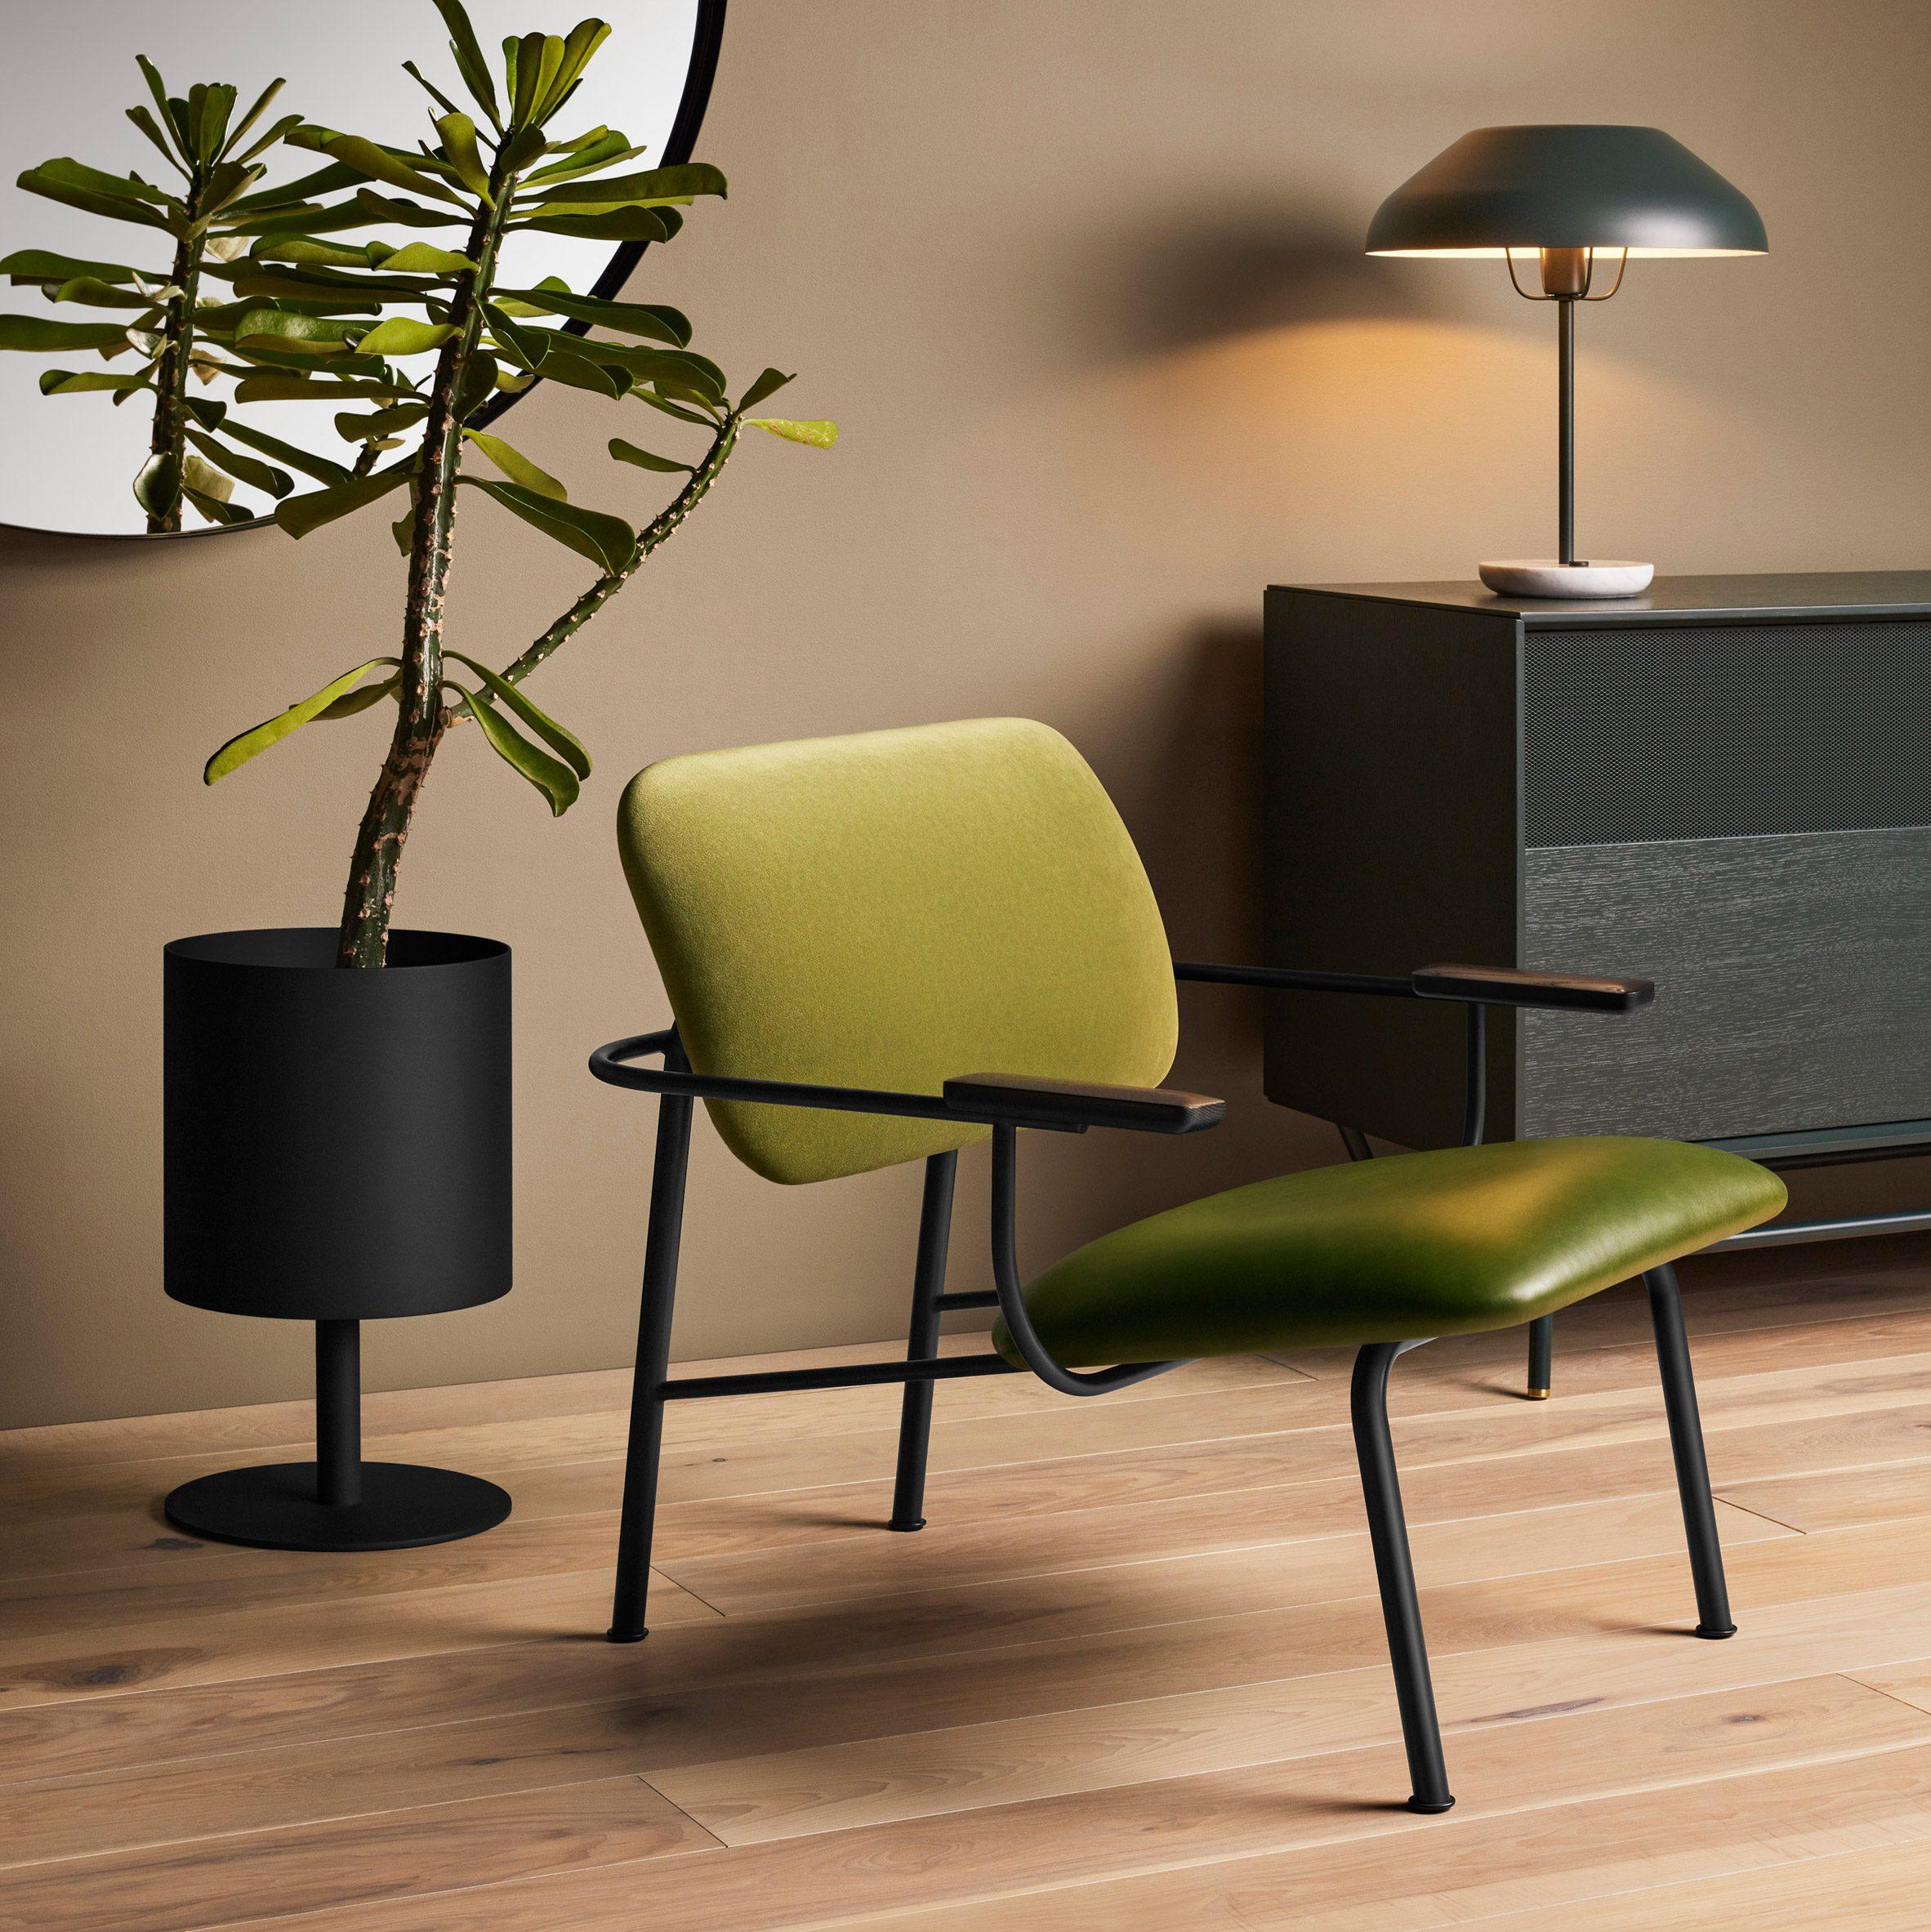 Method lounge chair by Blu Dot among new products on Dezeen Showroom